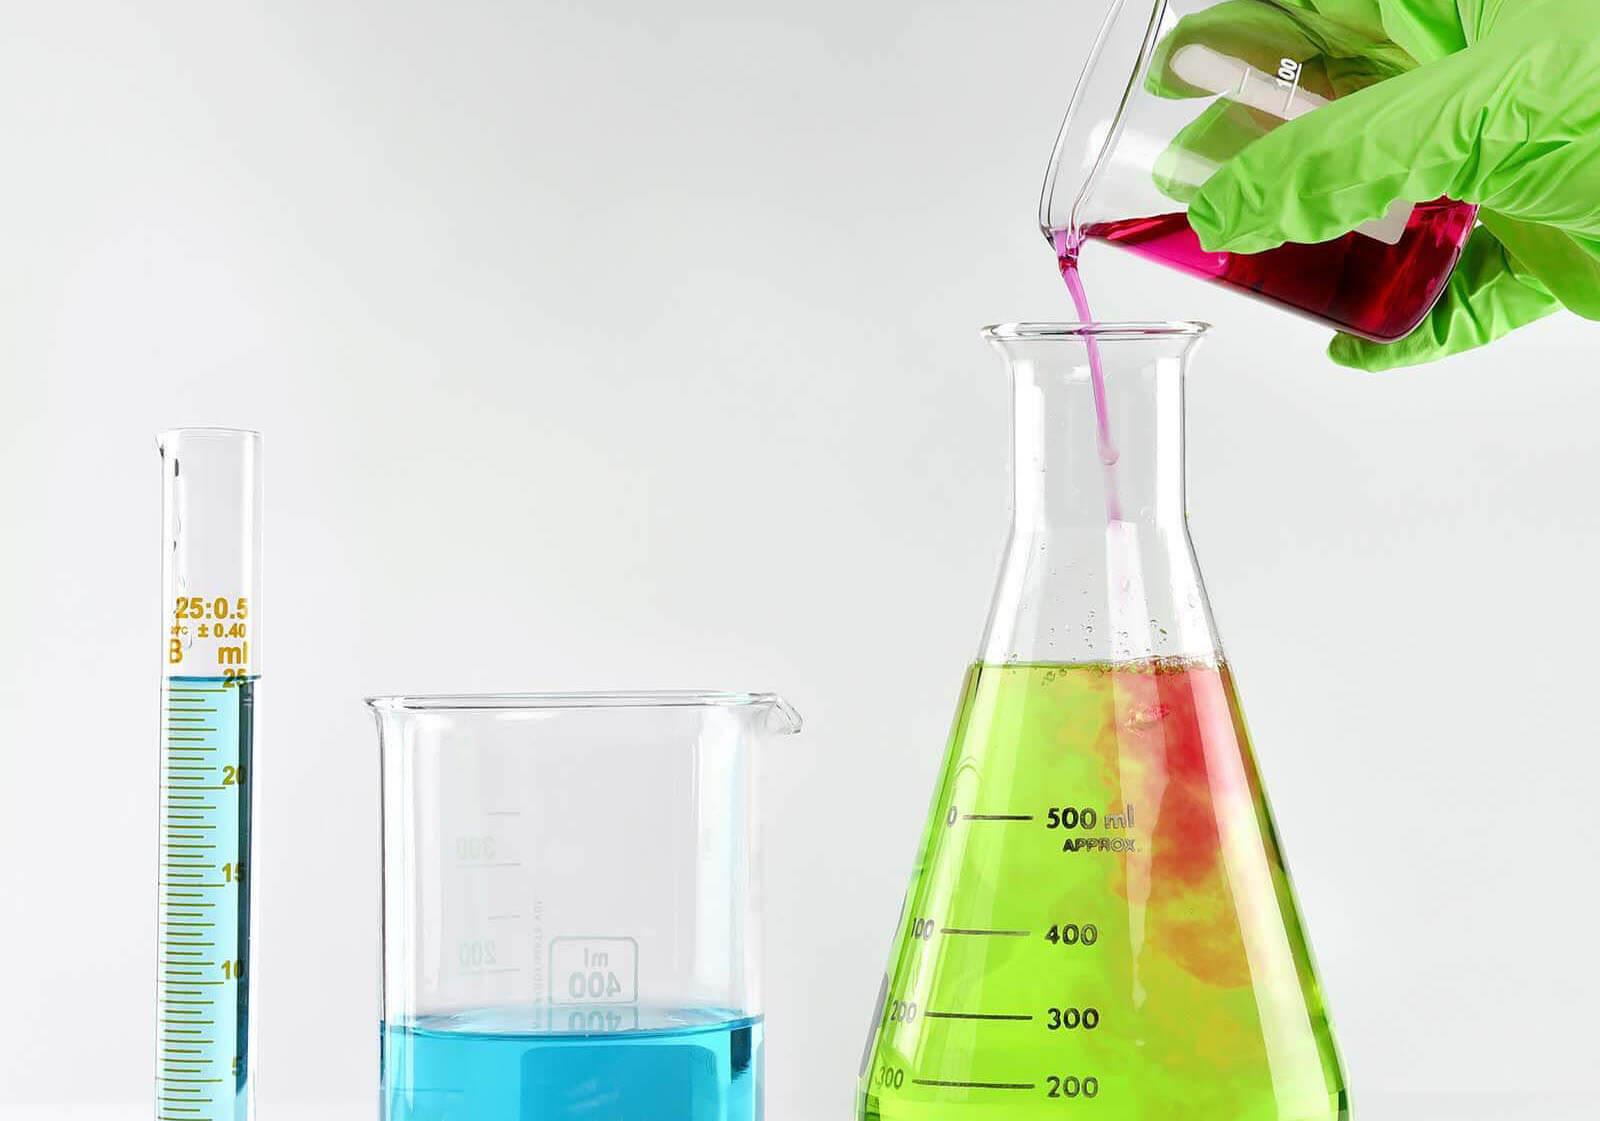 Toxic Substance Litigation